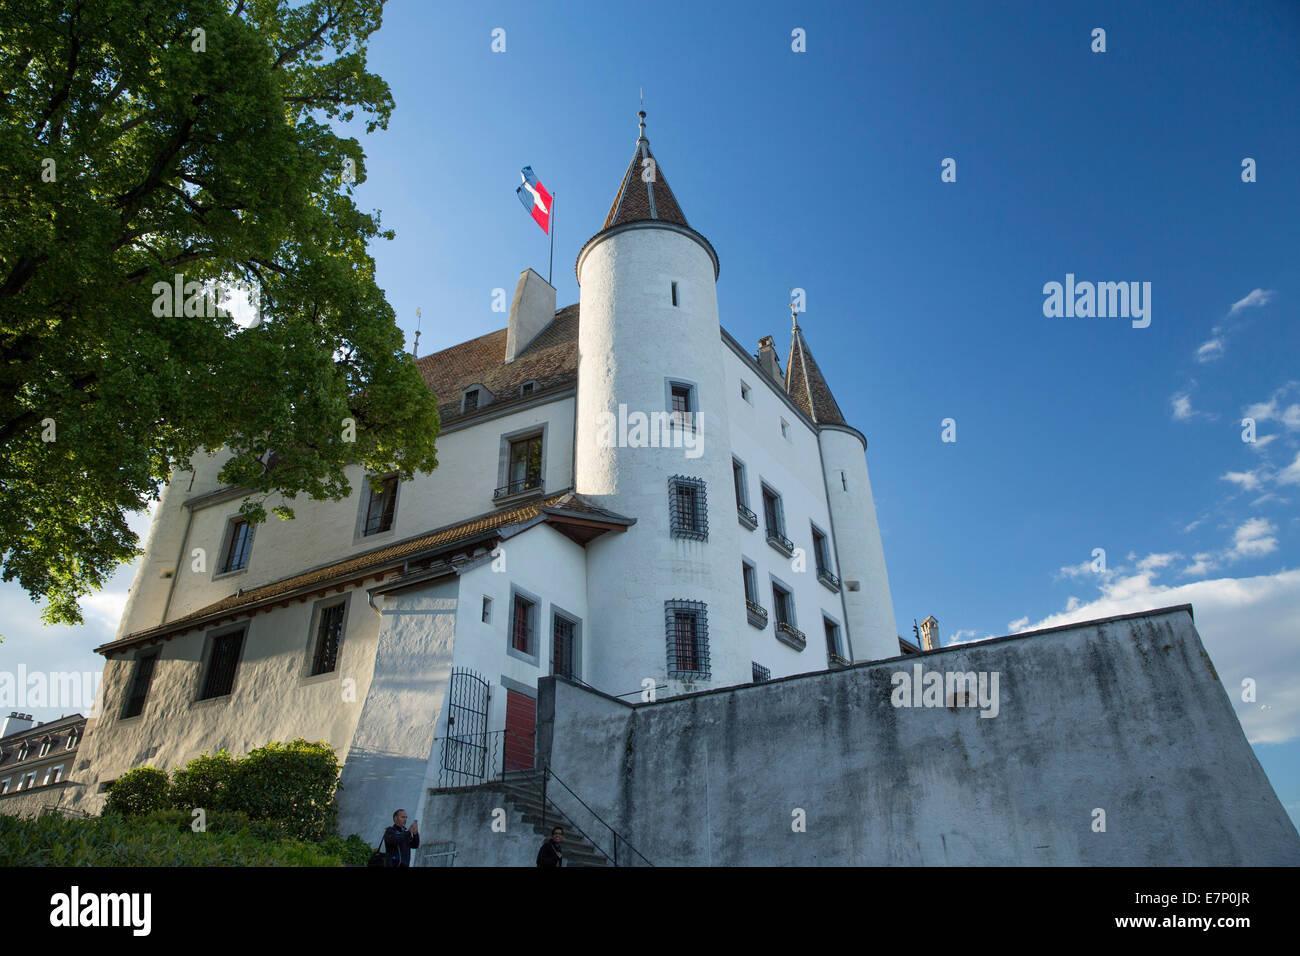 La Cote VD, castle, Nyon, lake Geneva, canton, VD, Vaud, Western Switerland, Romandie, lake Geneva, Switzerland, - Stock Image